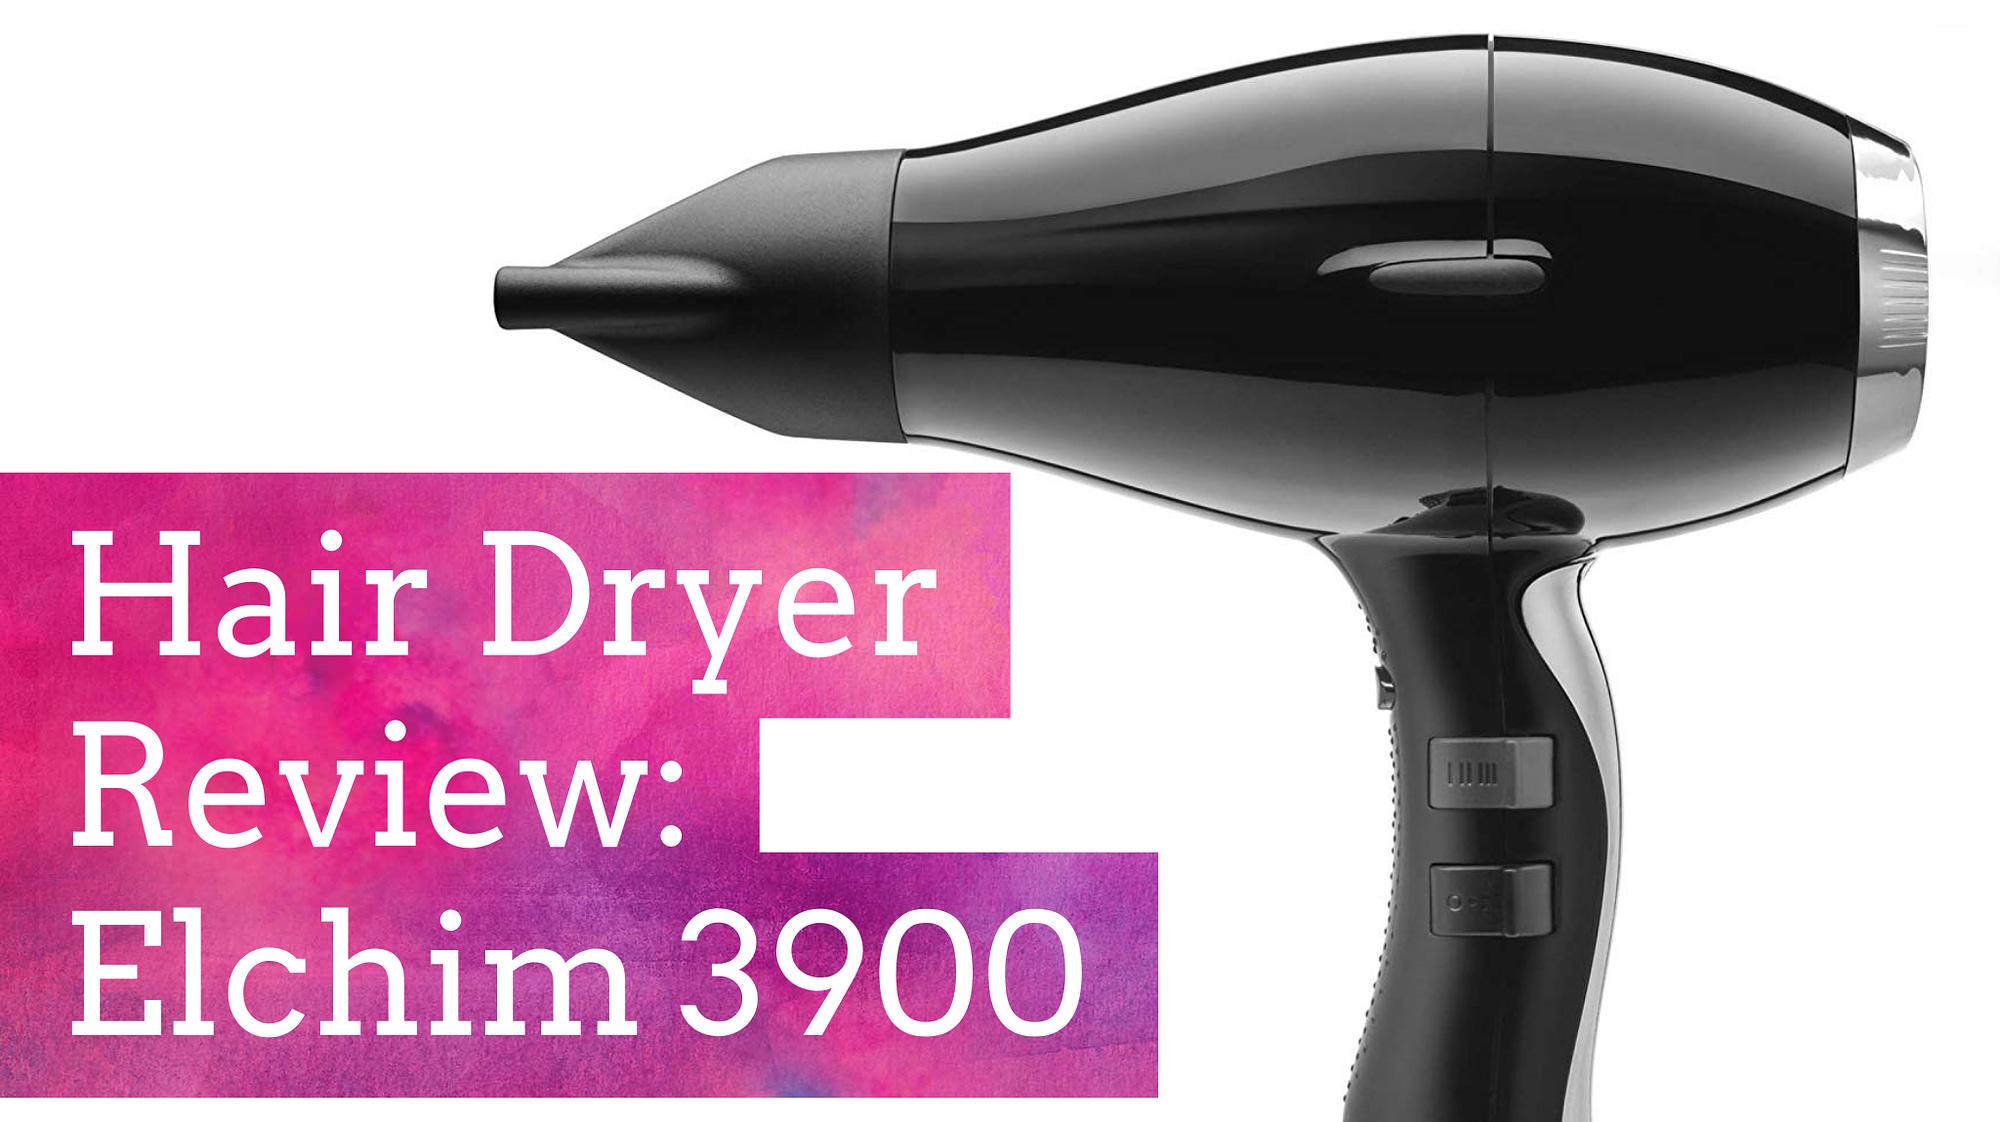 Hair Dryer Review: Elchim 3900